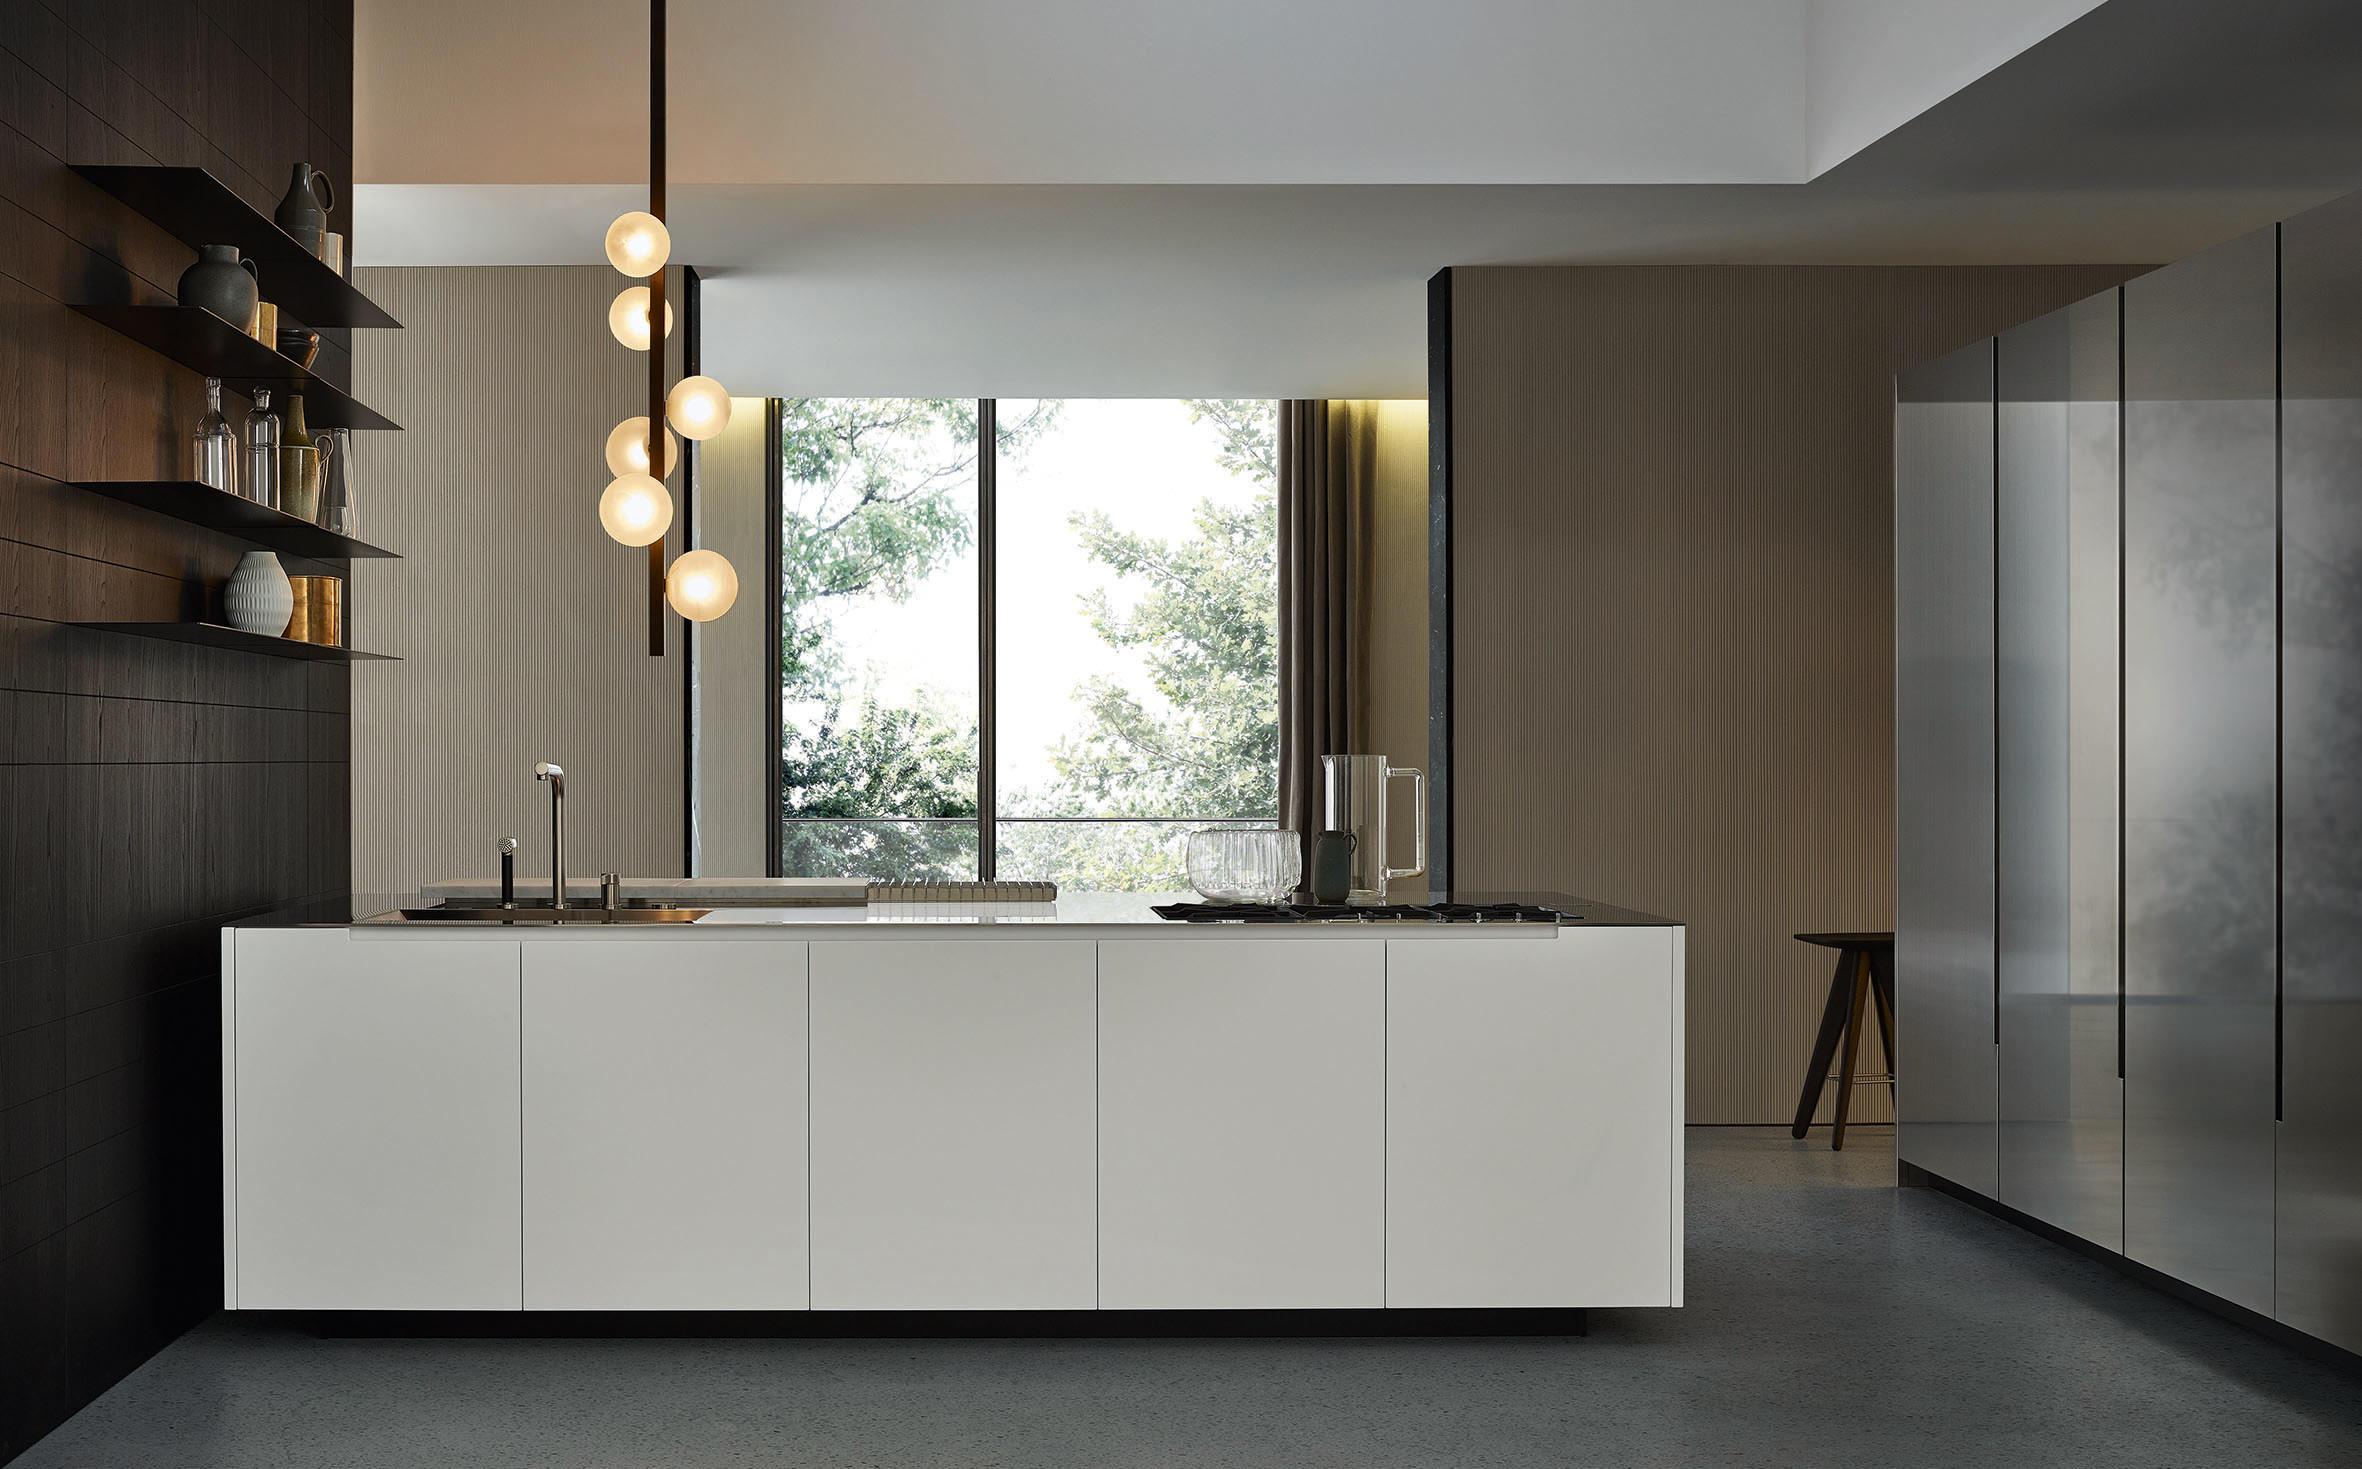 Phoenix island kitchens from varenna poliform architonic - Cucina a elle ...